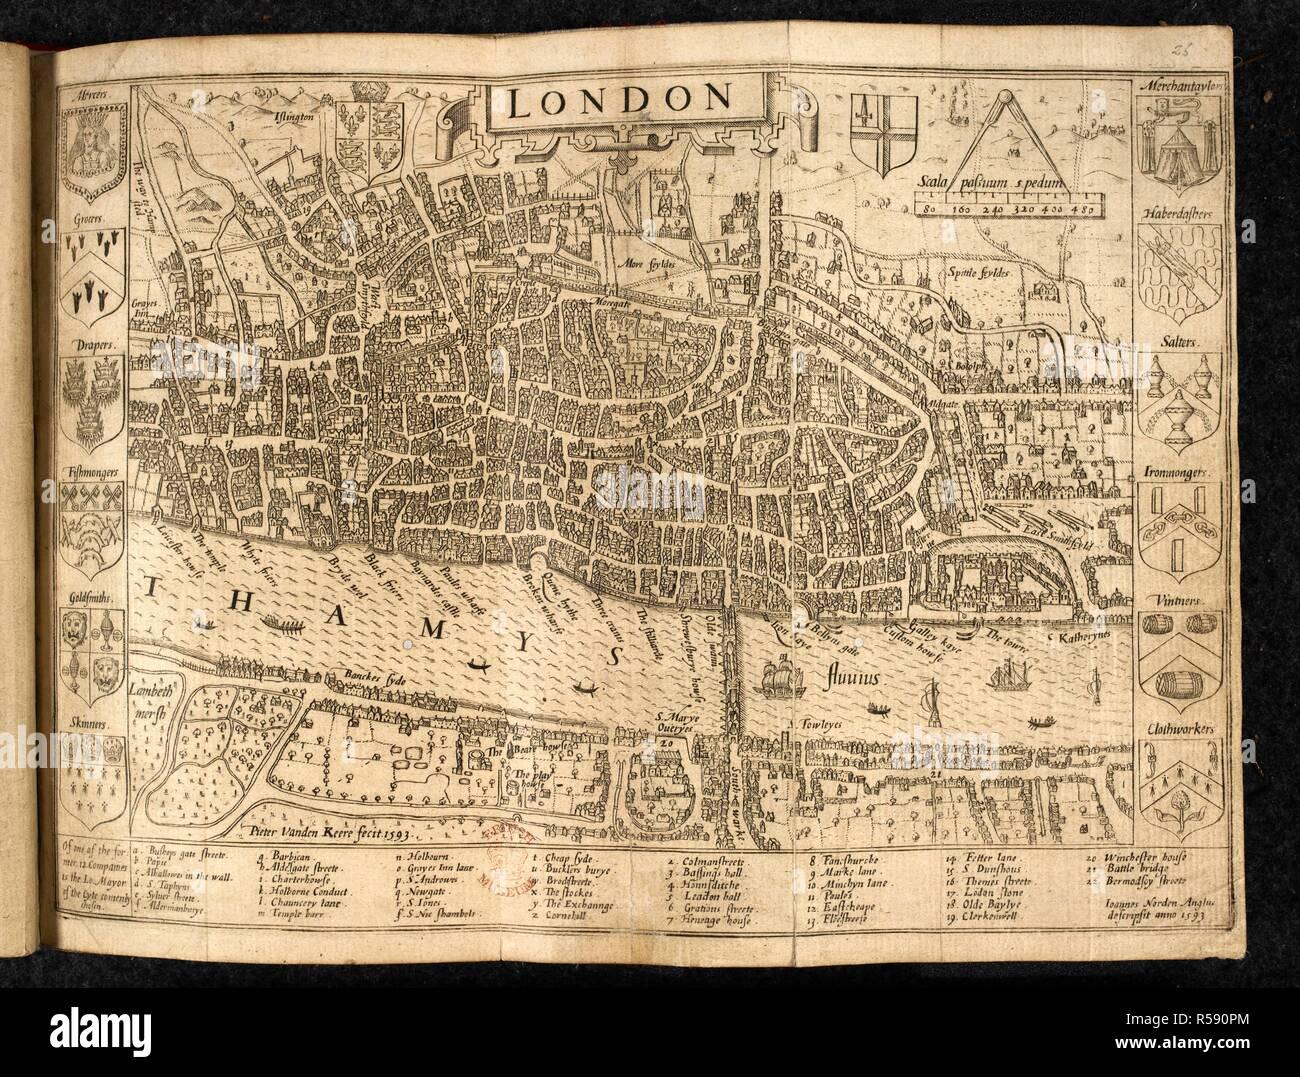 A map of London. London. Ioannes Norden Anglus descripsit anno 1593. Pieter vanden Keere fecit. Scala passuum 5 pedum, 320[ = 25 mm]. [London], 1593. Source: Maps C.7.b.23.(1.), opposite page 26. Language: English. Stock Photo